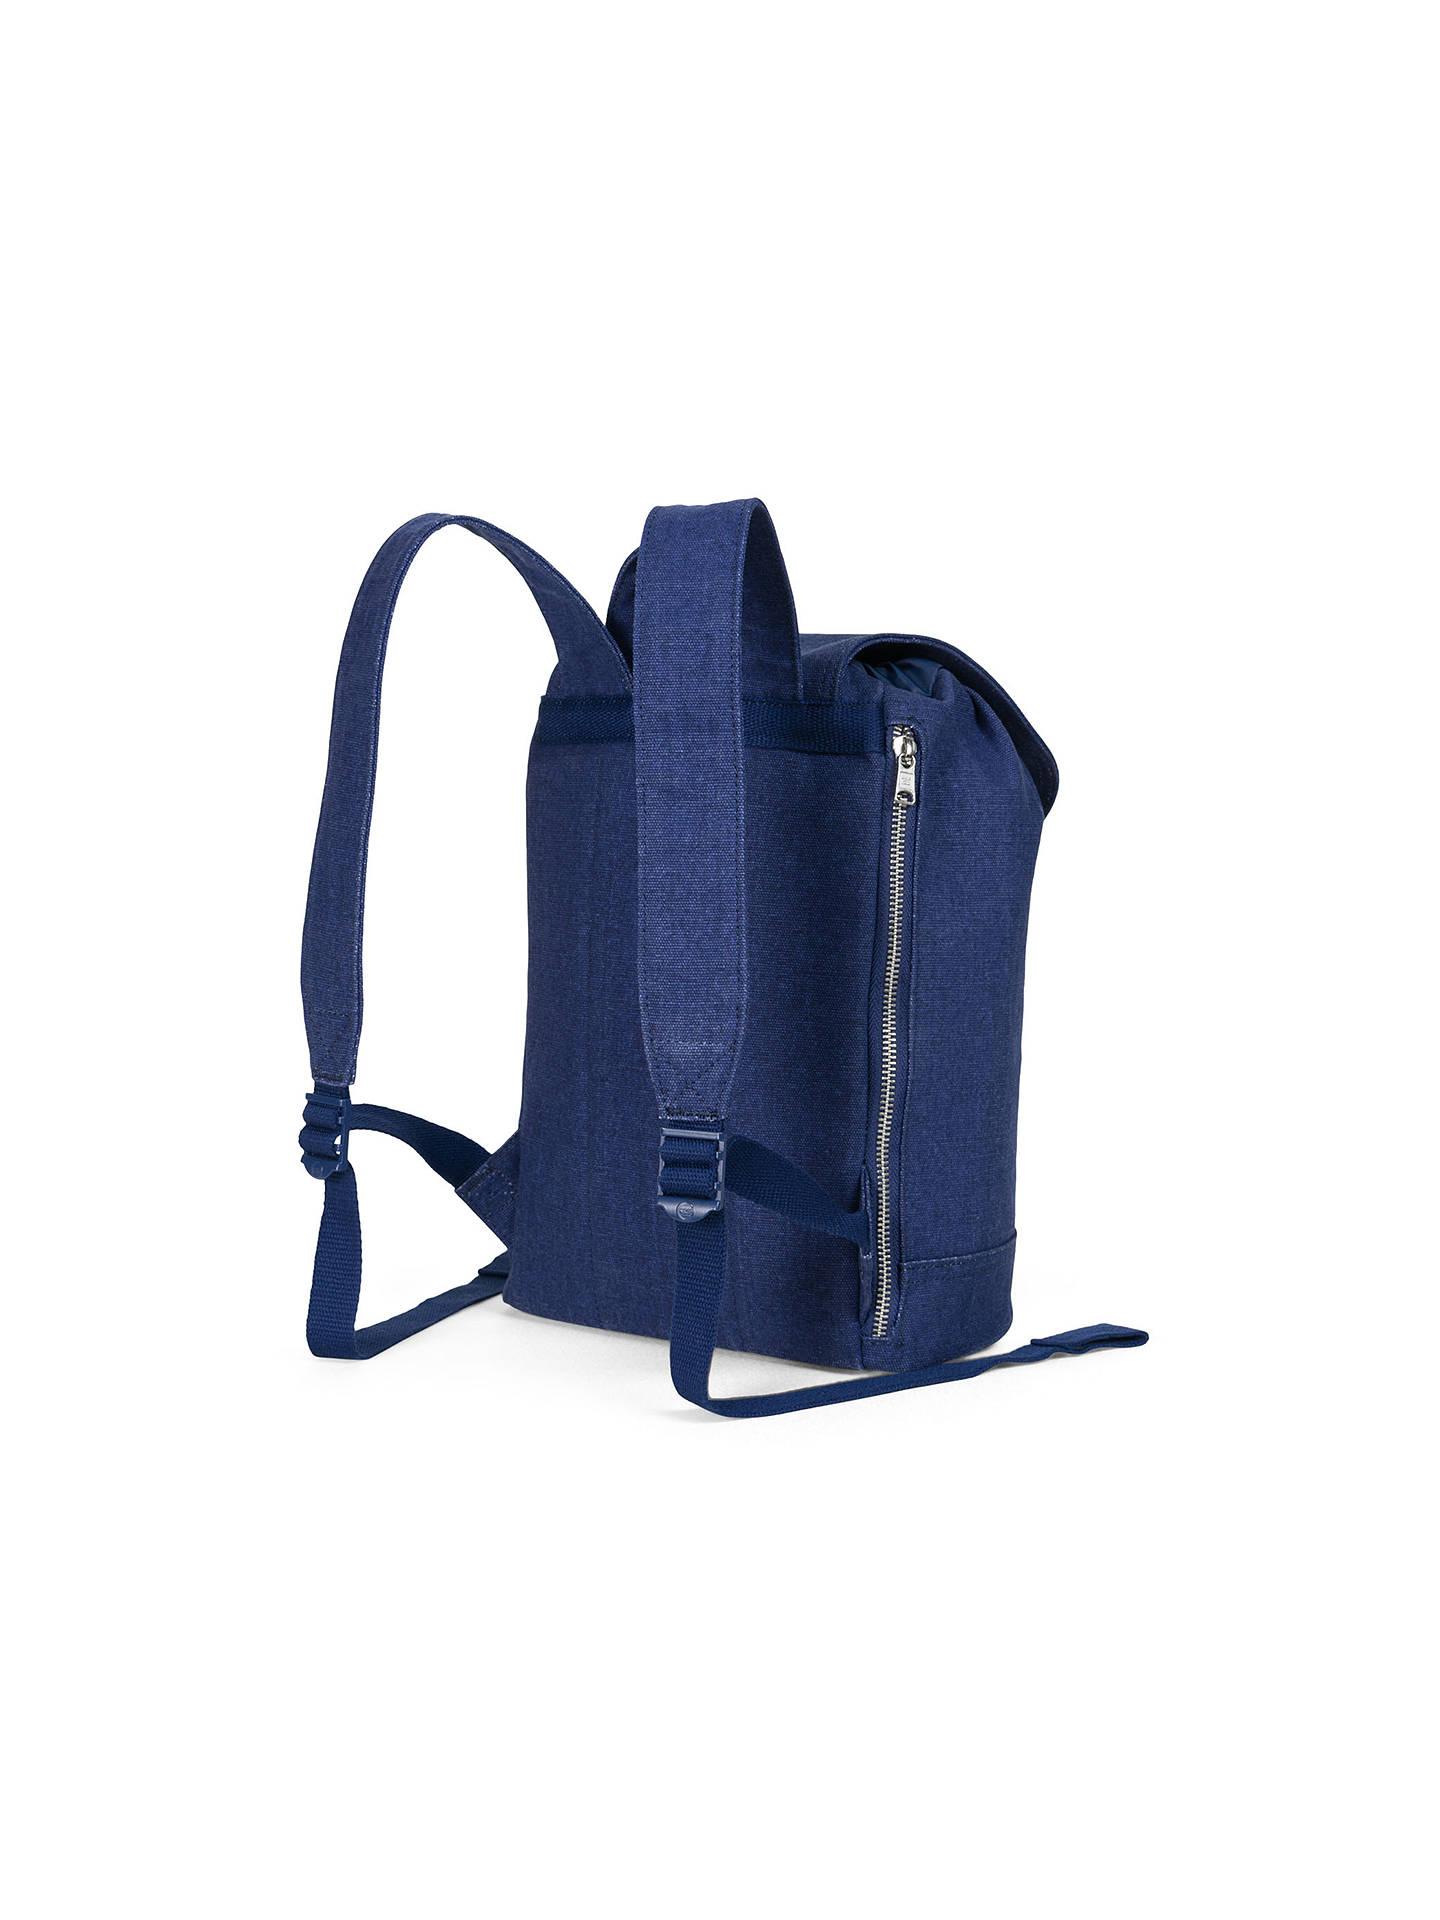 f108b1bd48 ... Buy Herschel Supply Co. Reid Backpack